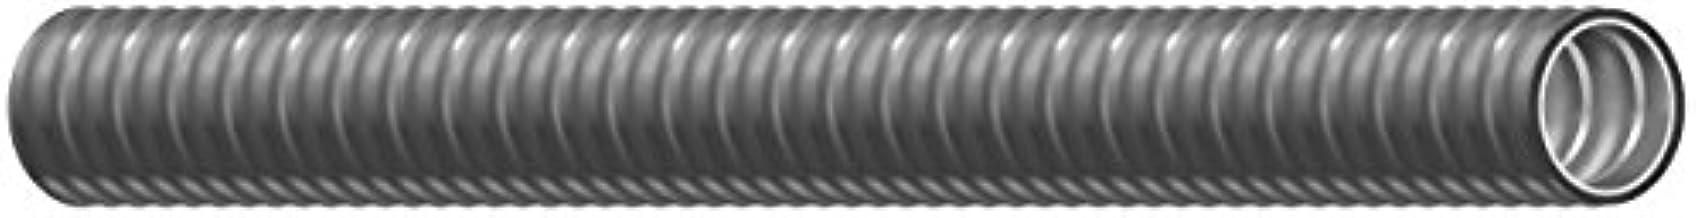 Southwire 55093305 1.25-inch x 50-Foot Liquid-Tight Flexible Metallic Conduit